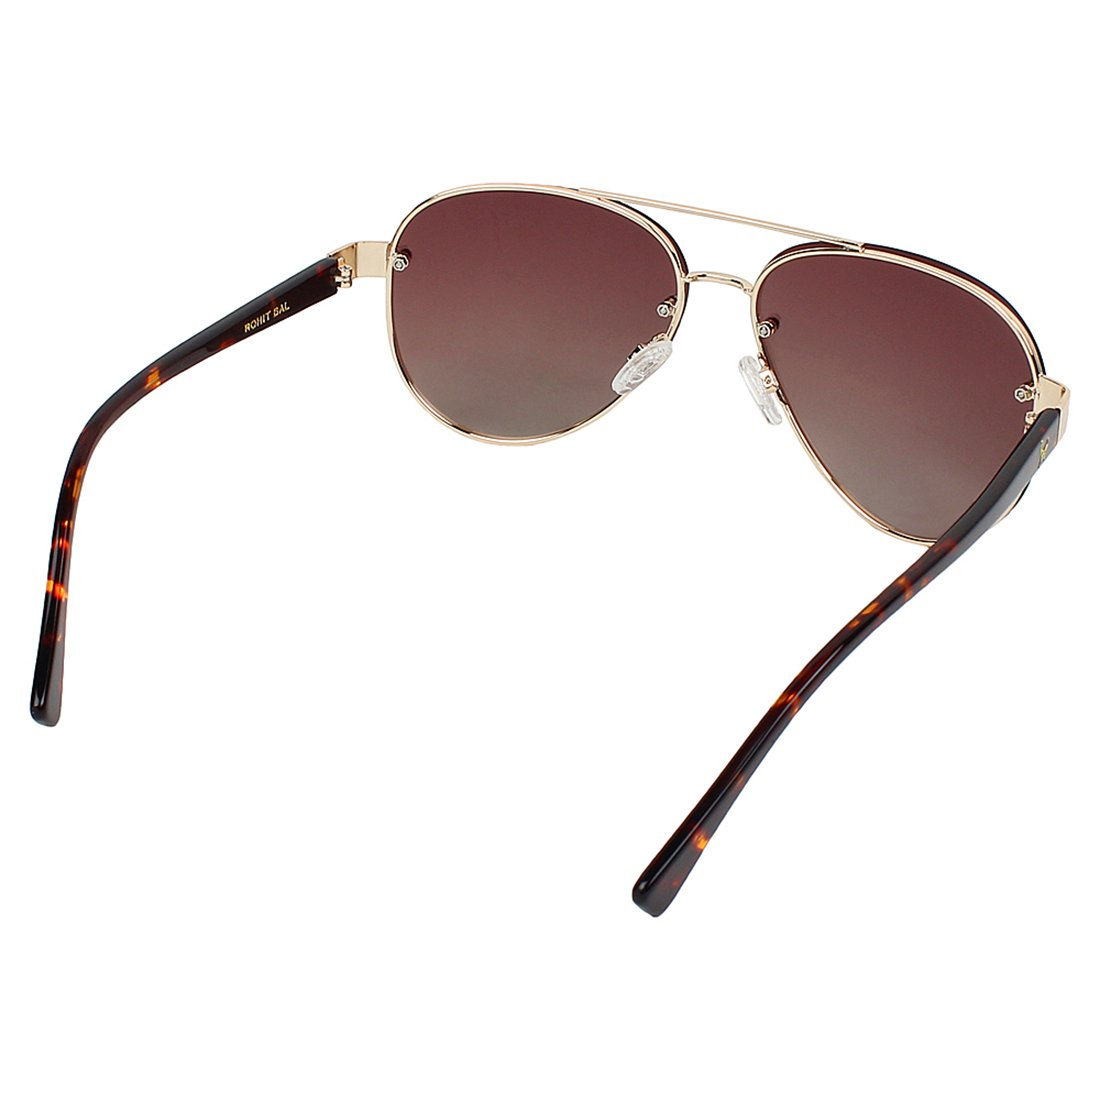 882bec0fd4 Rohit Bal Men s Double Bridge Aviator Sunglasses